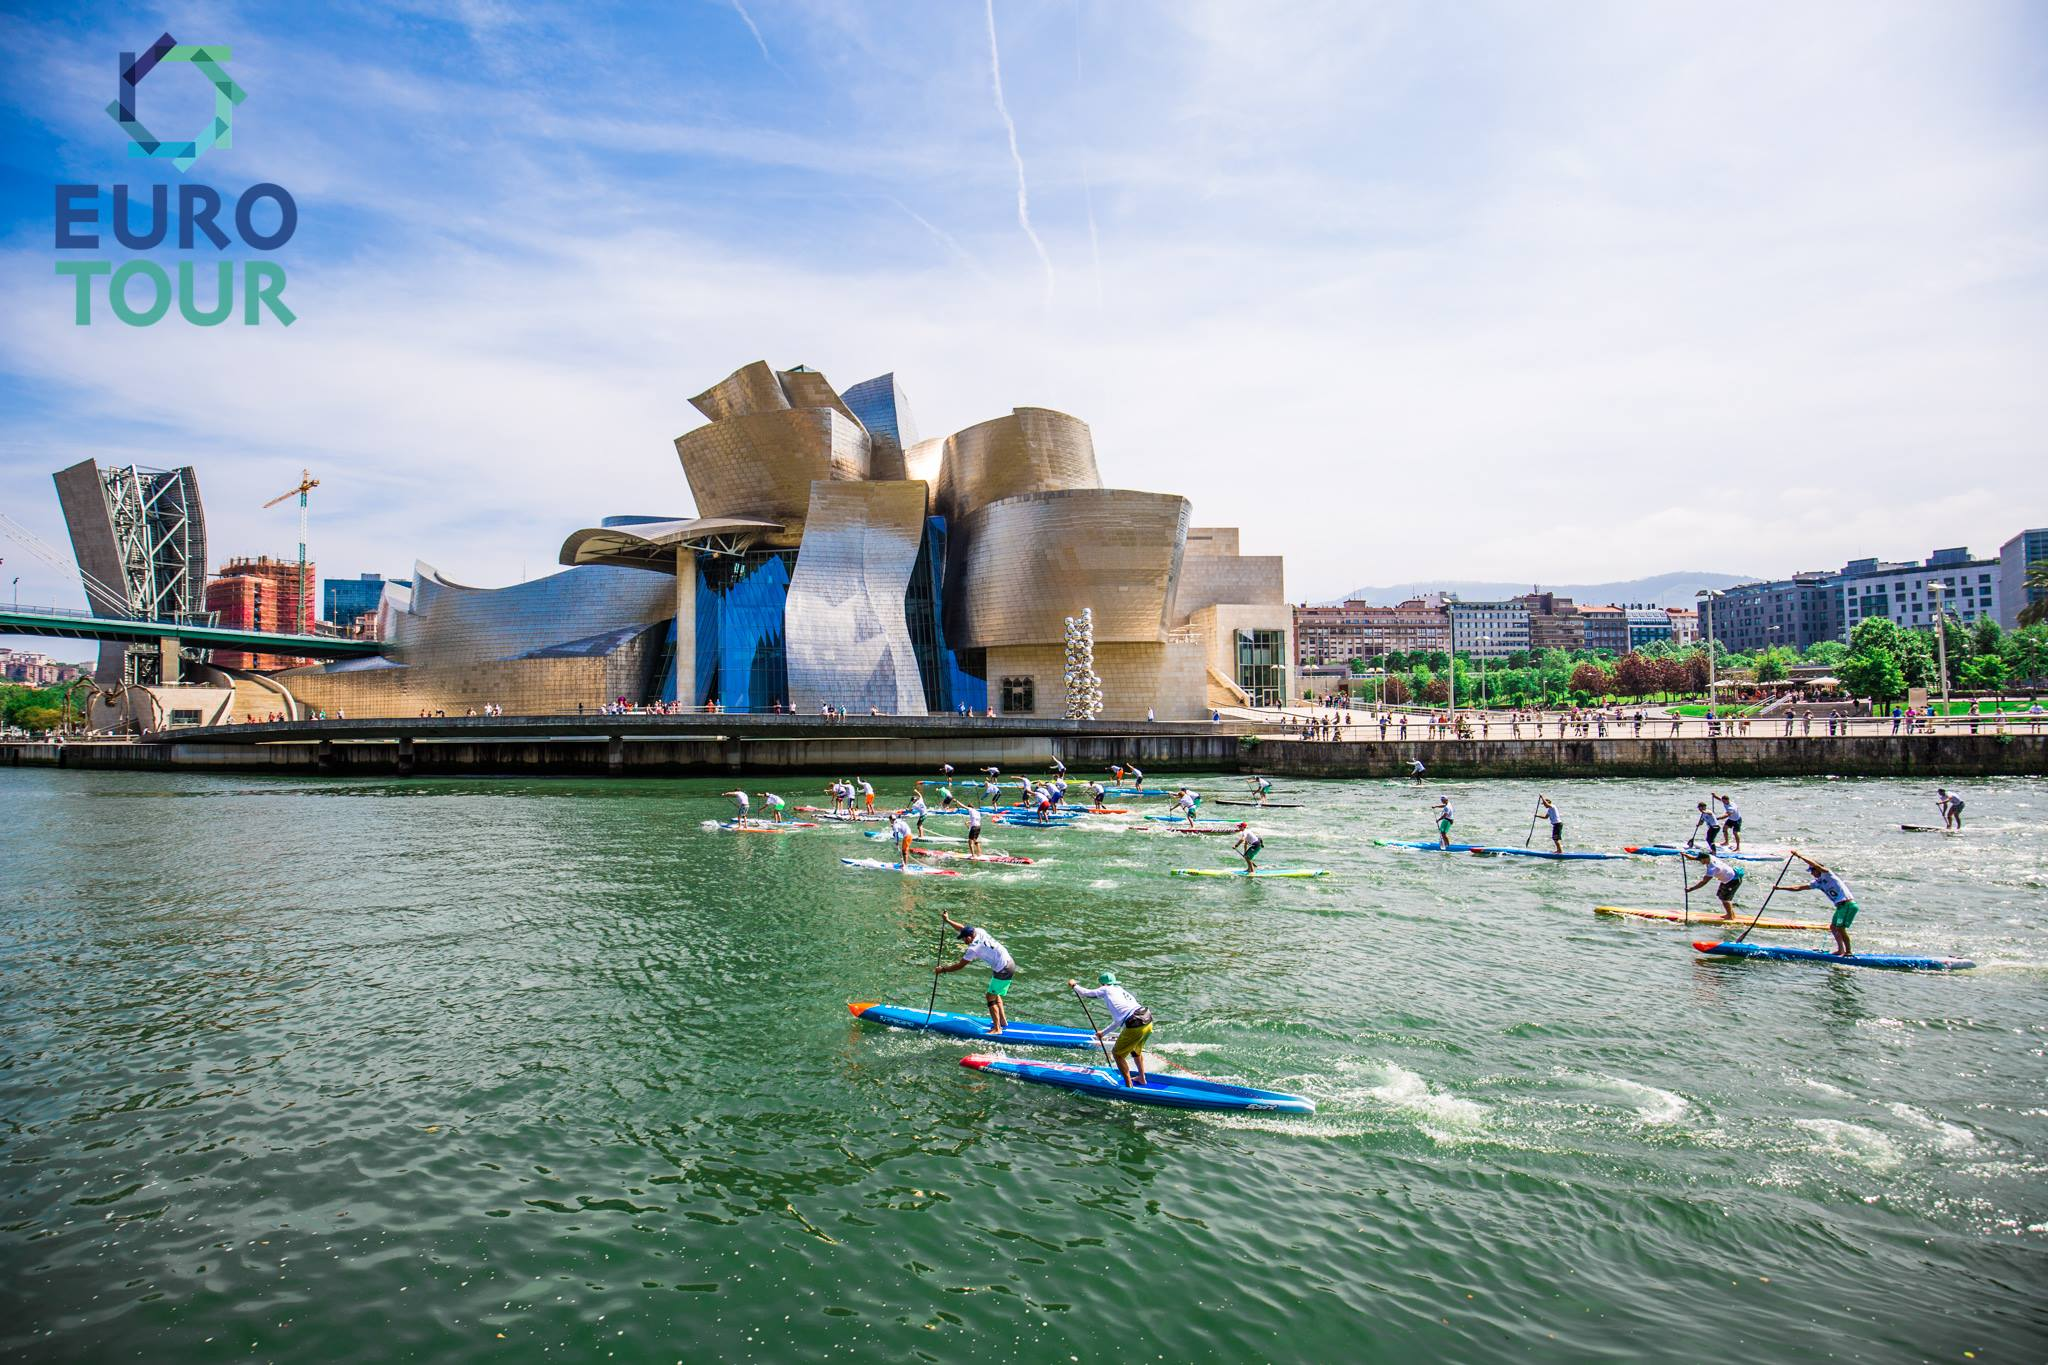 The Euro Tour vor dem Guggenheim Museum in Bilbao